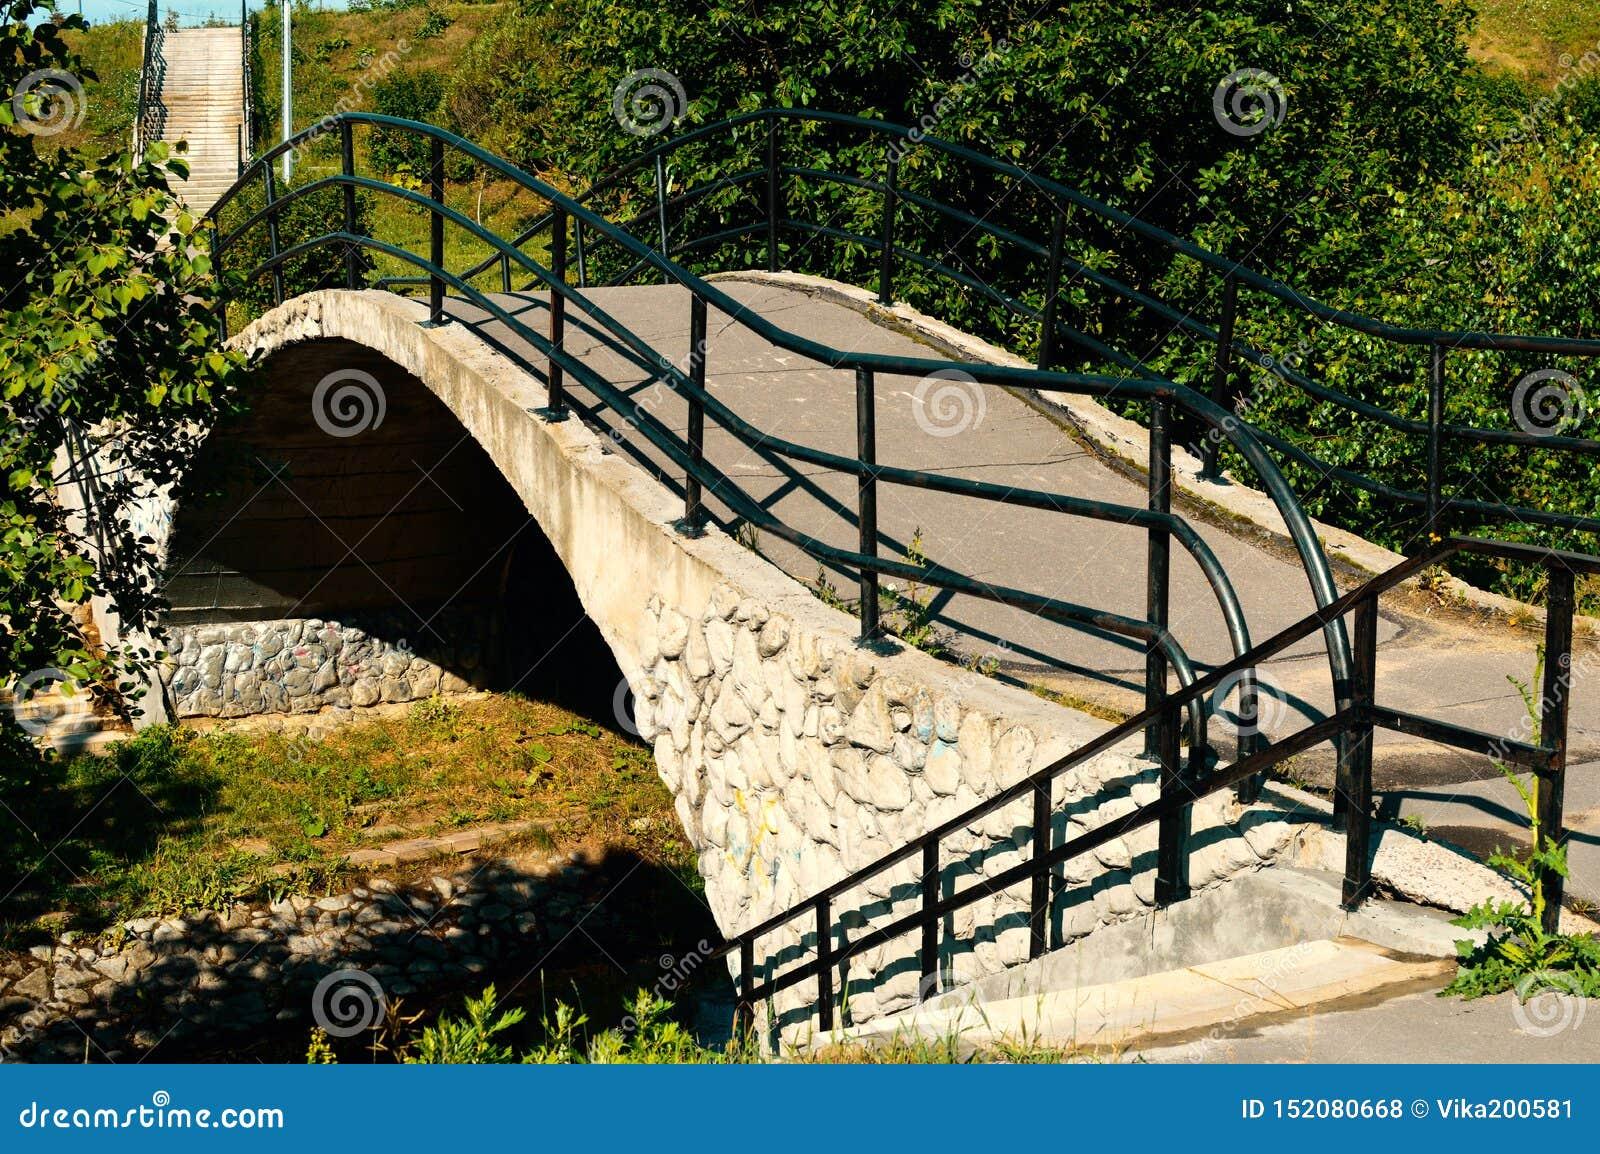 Stone Bridge over little river in the city park